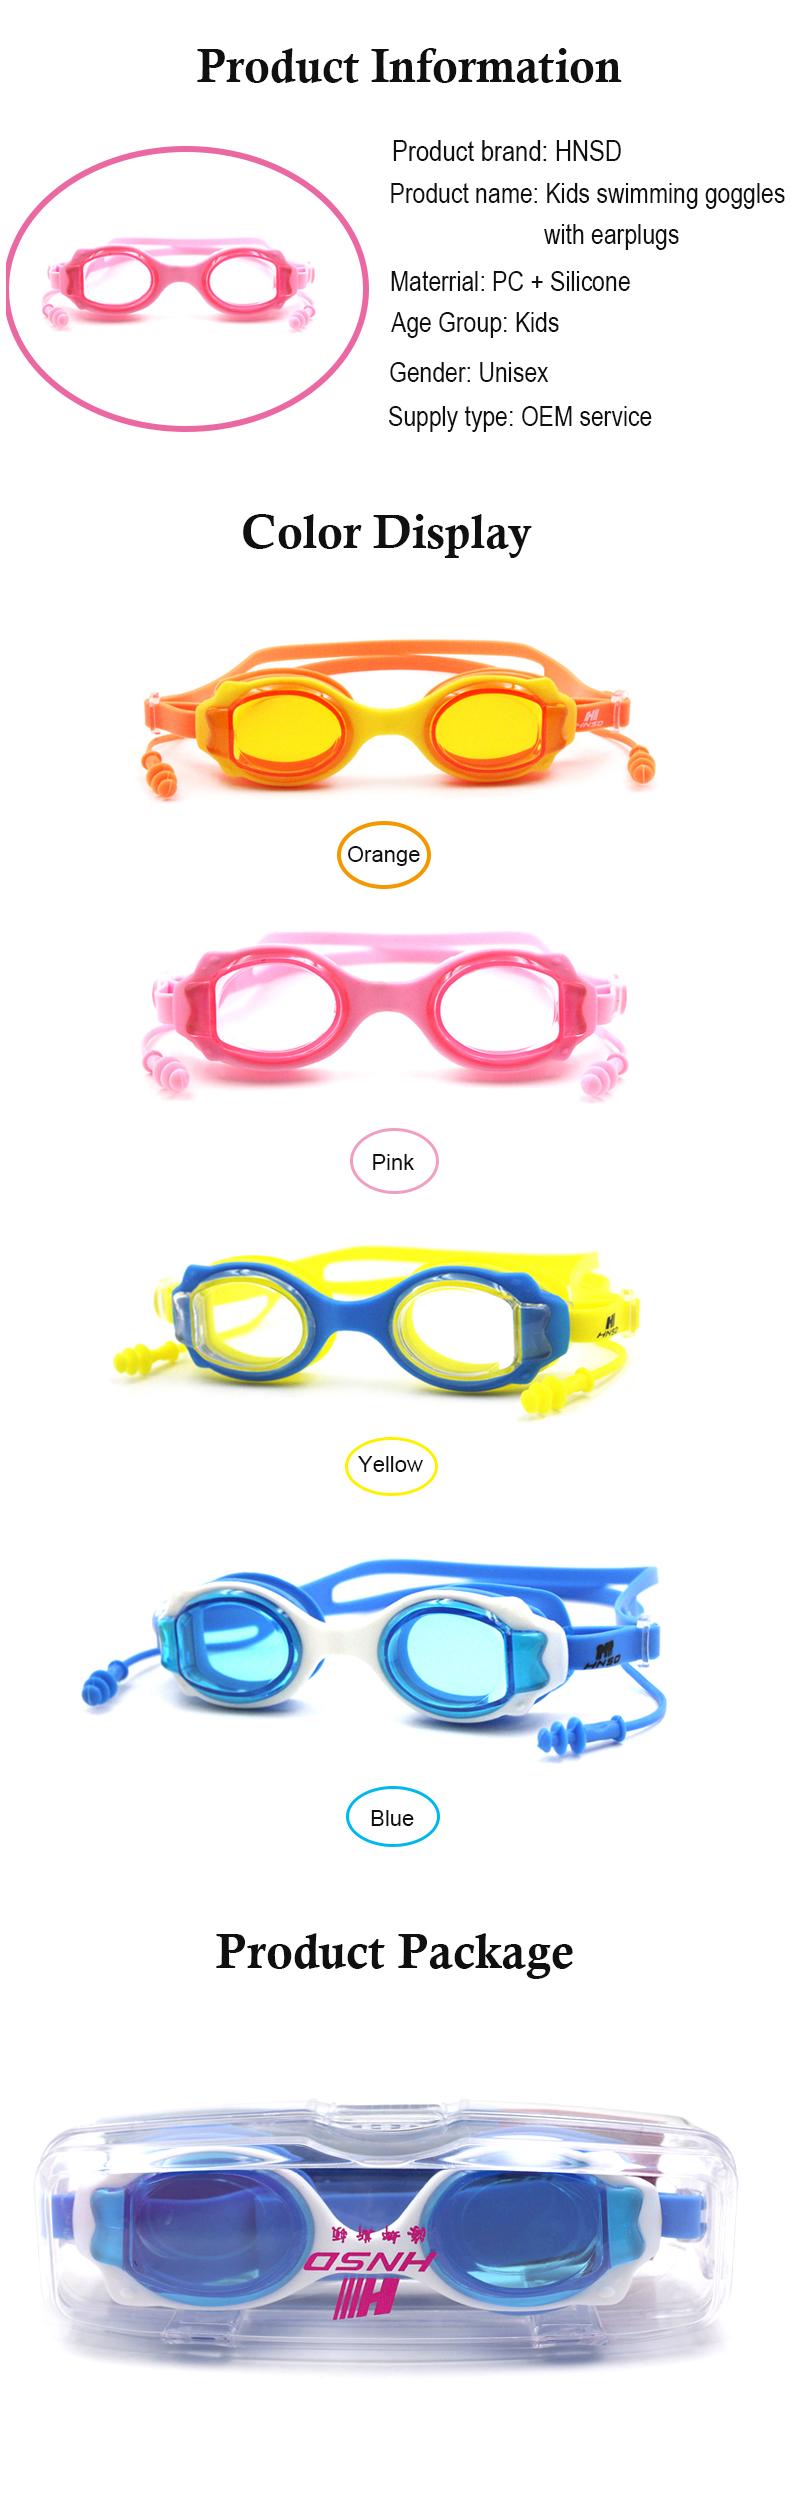 77151a1a85 New design kids swim goggles anti fog and uv protect children swimming  glasses